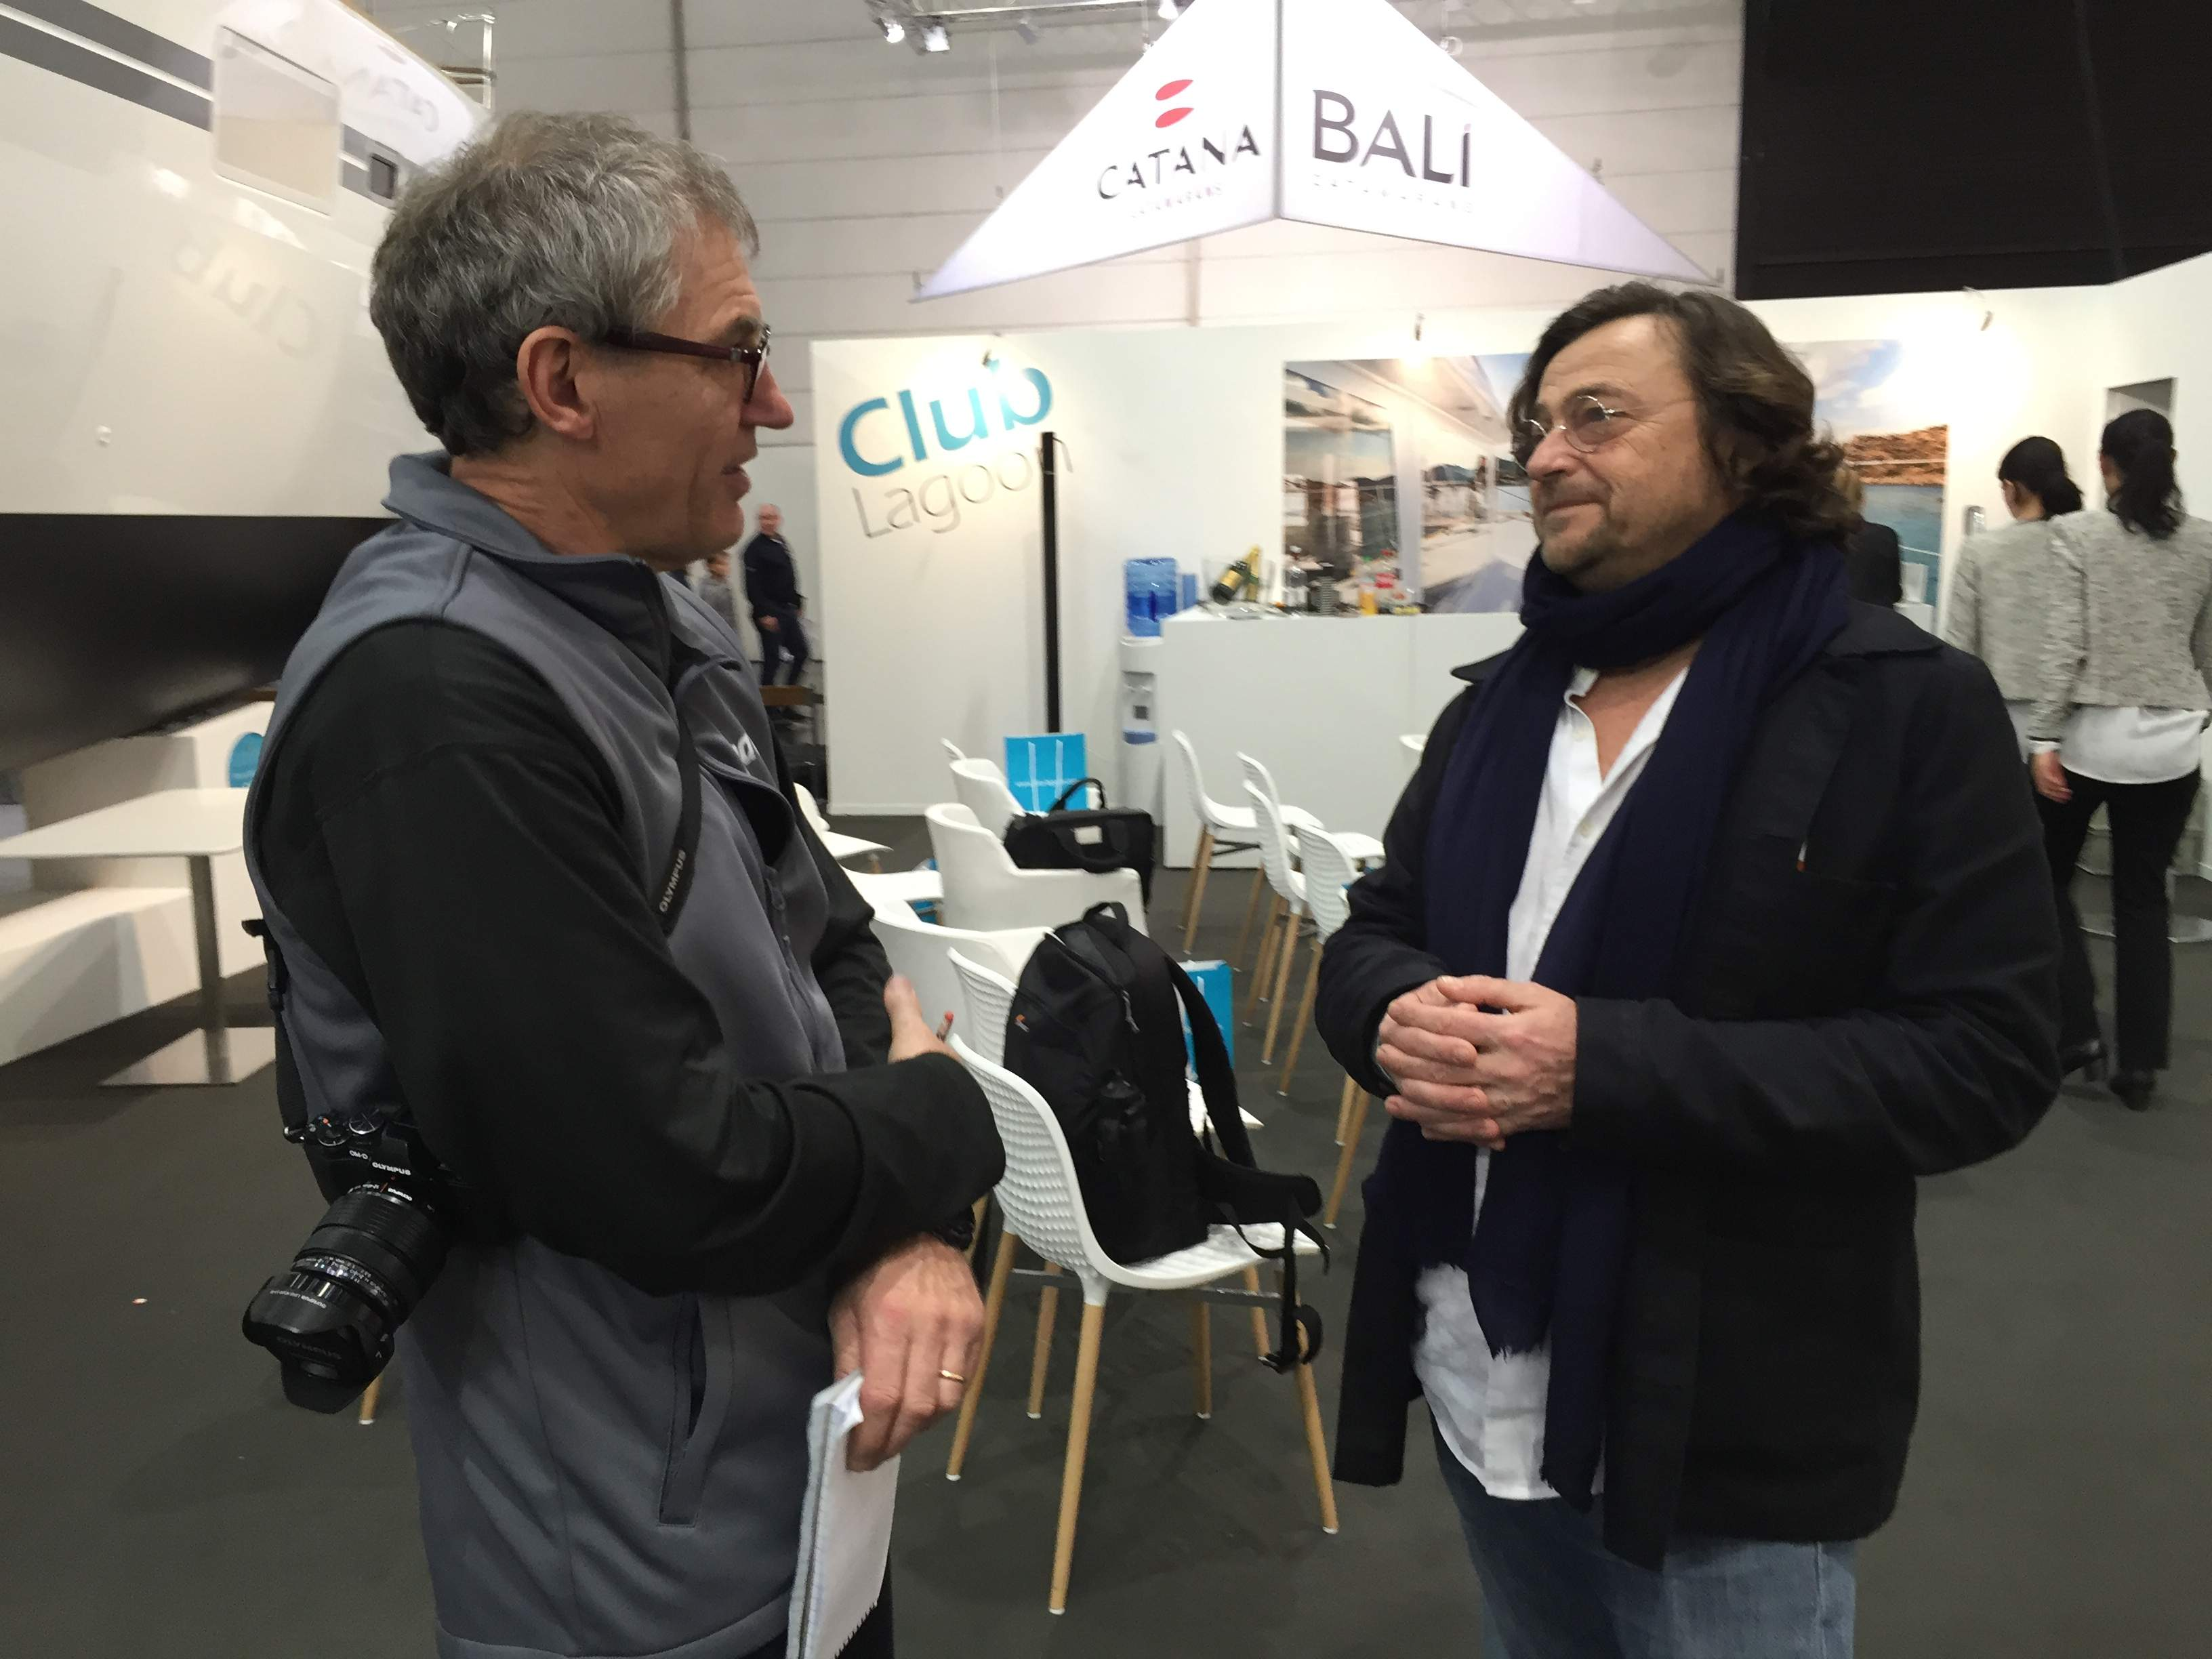 Redakteur Dieter Loibner im Gespräch mit Konstrukteur Marc van Pethegem. Foto: John Burnham/boats.com